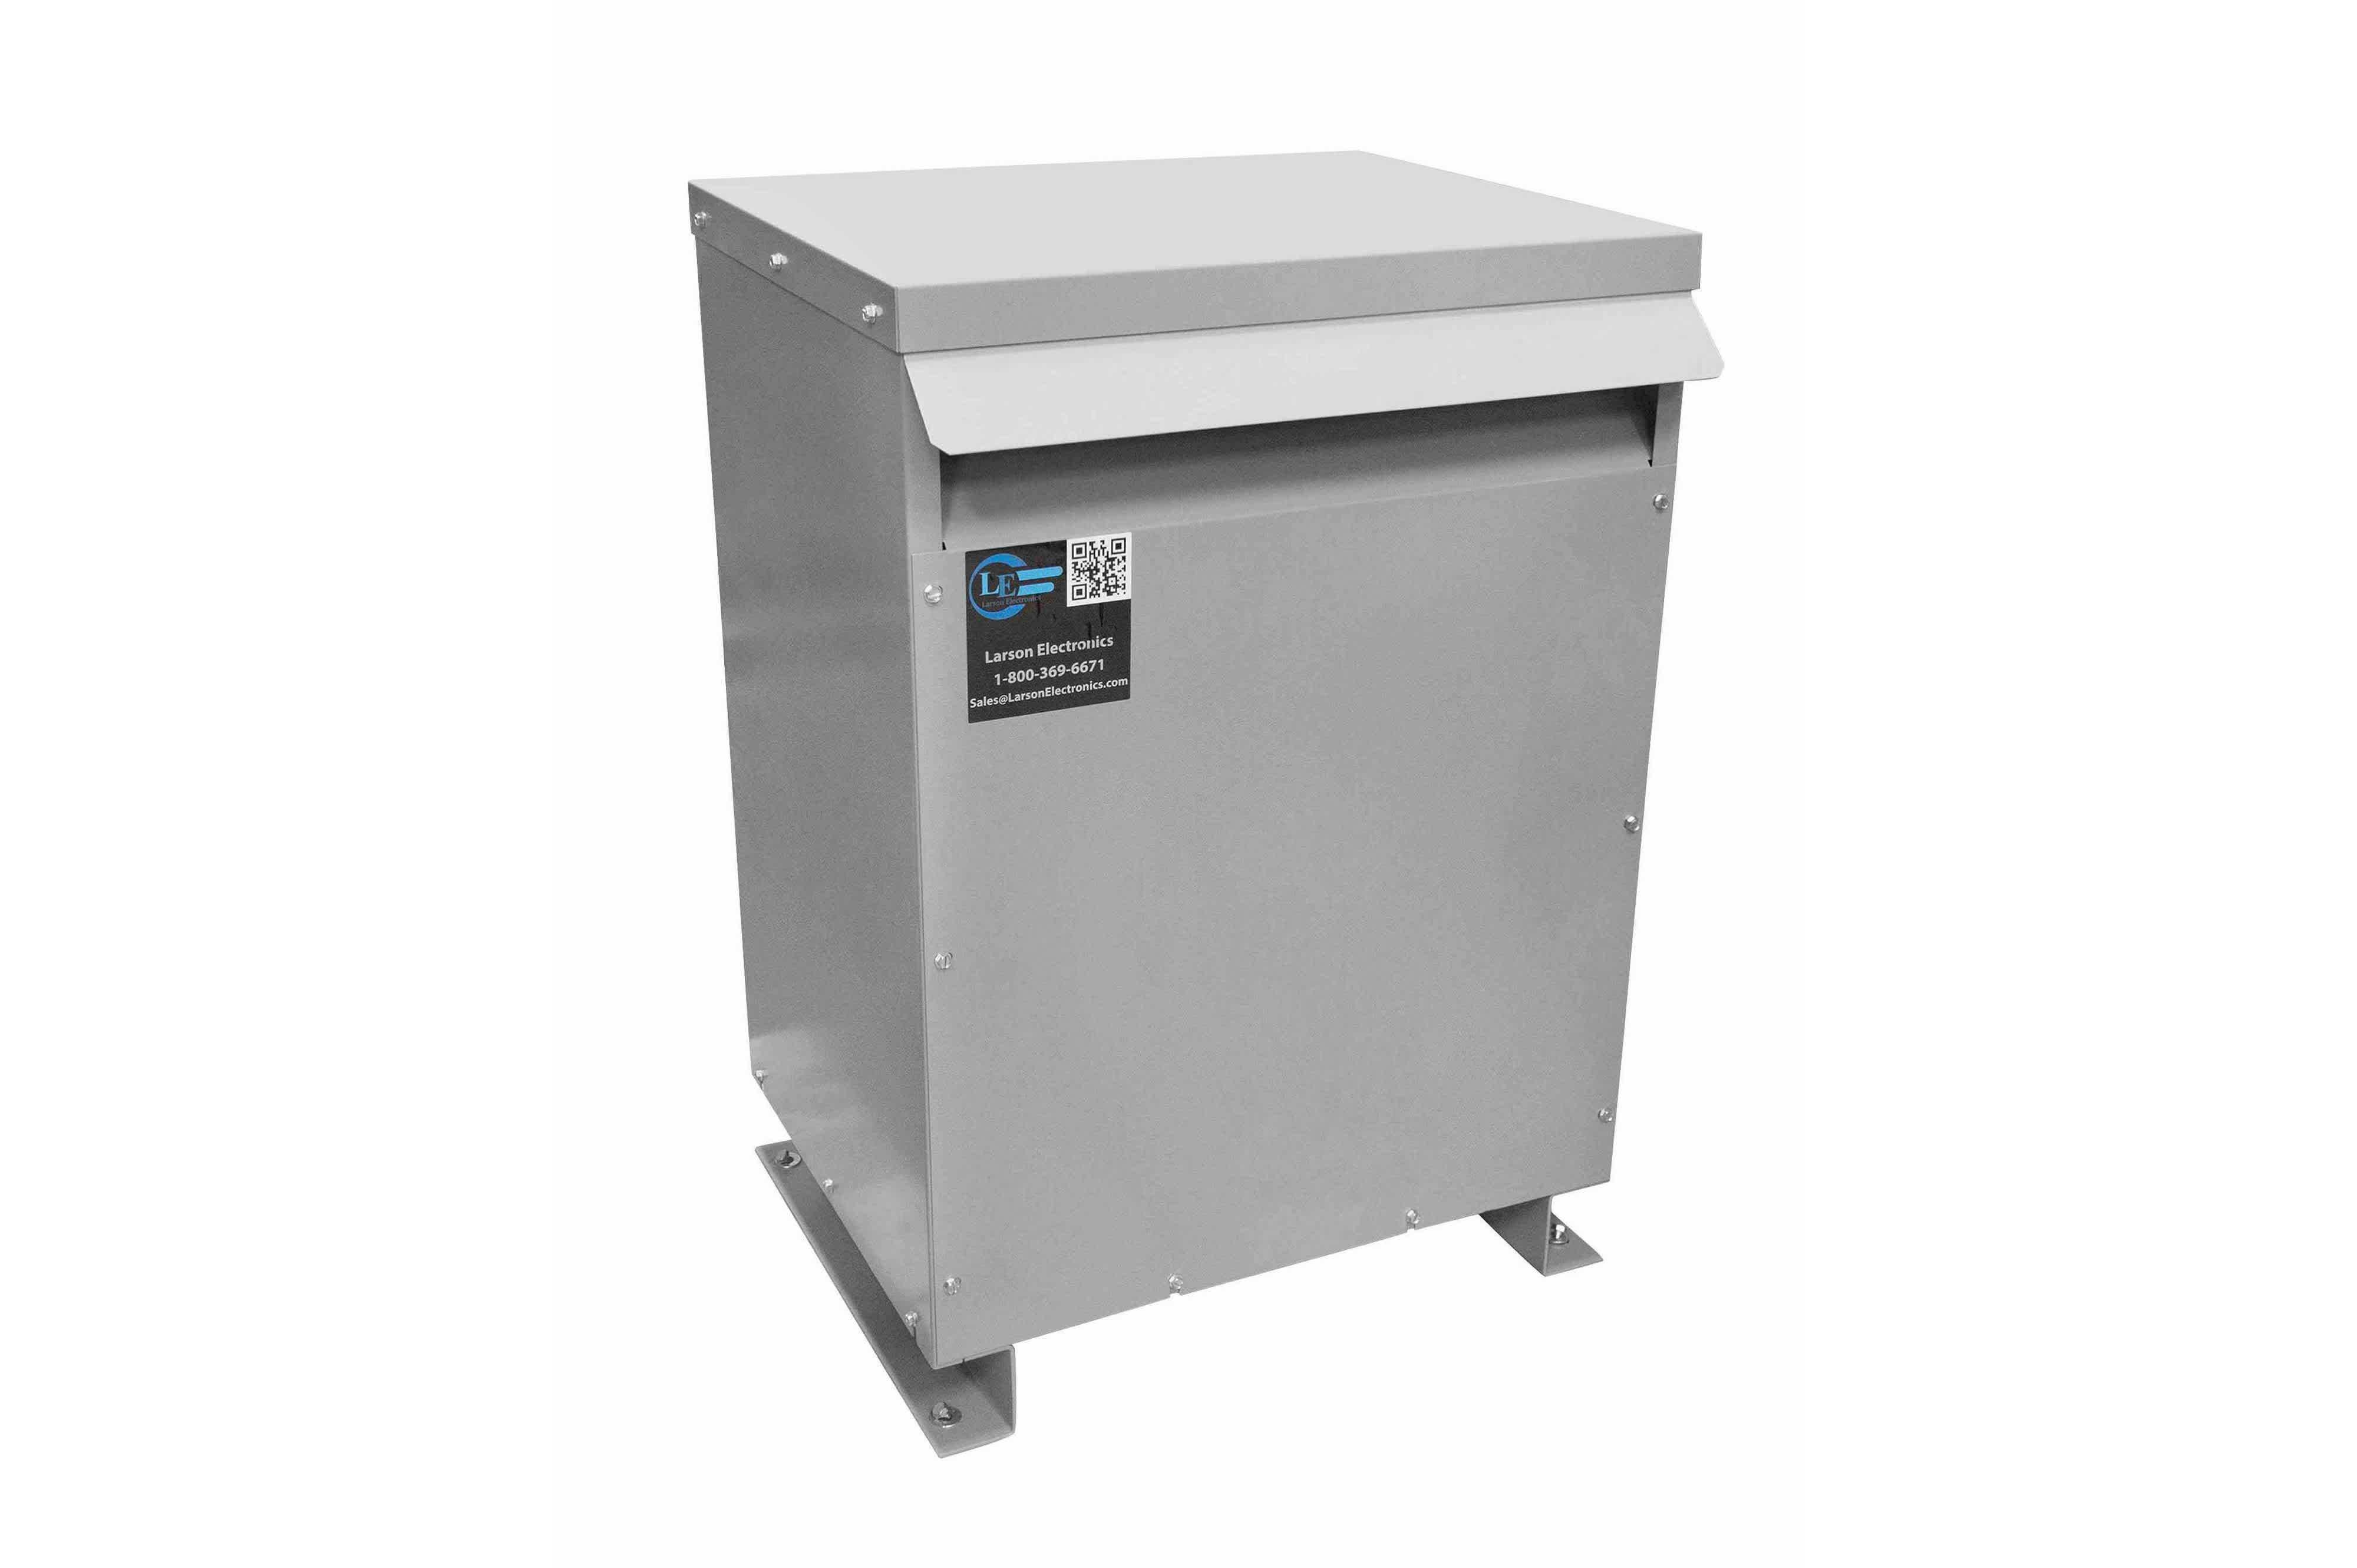 137.5 kVA 3PH Isolation Transformer, 380V Wye Primary, 240V Delta Secondary, N3R, Ventilated, 60 Hz